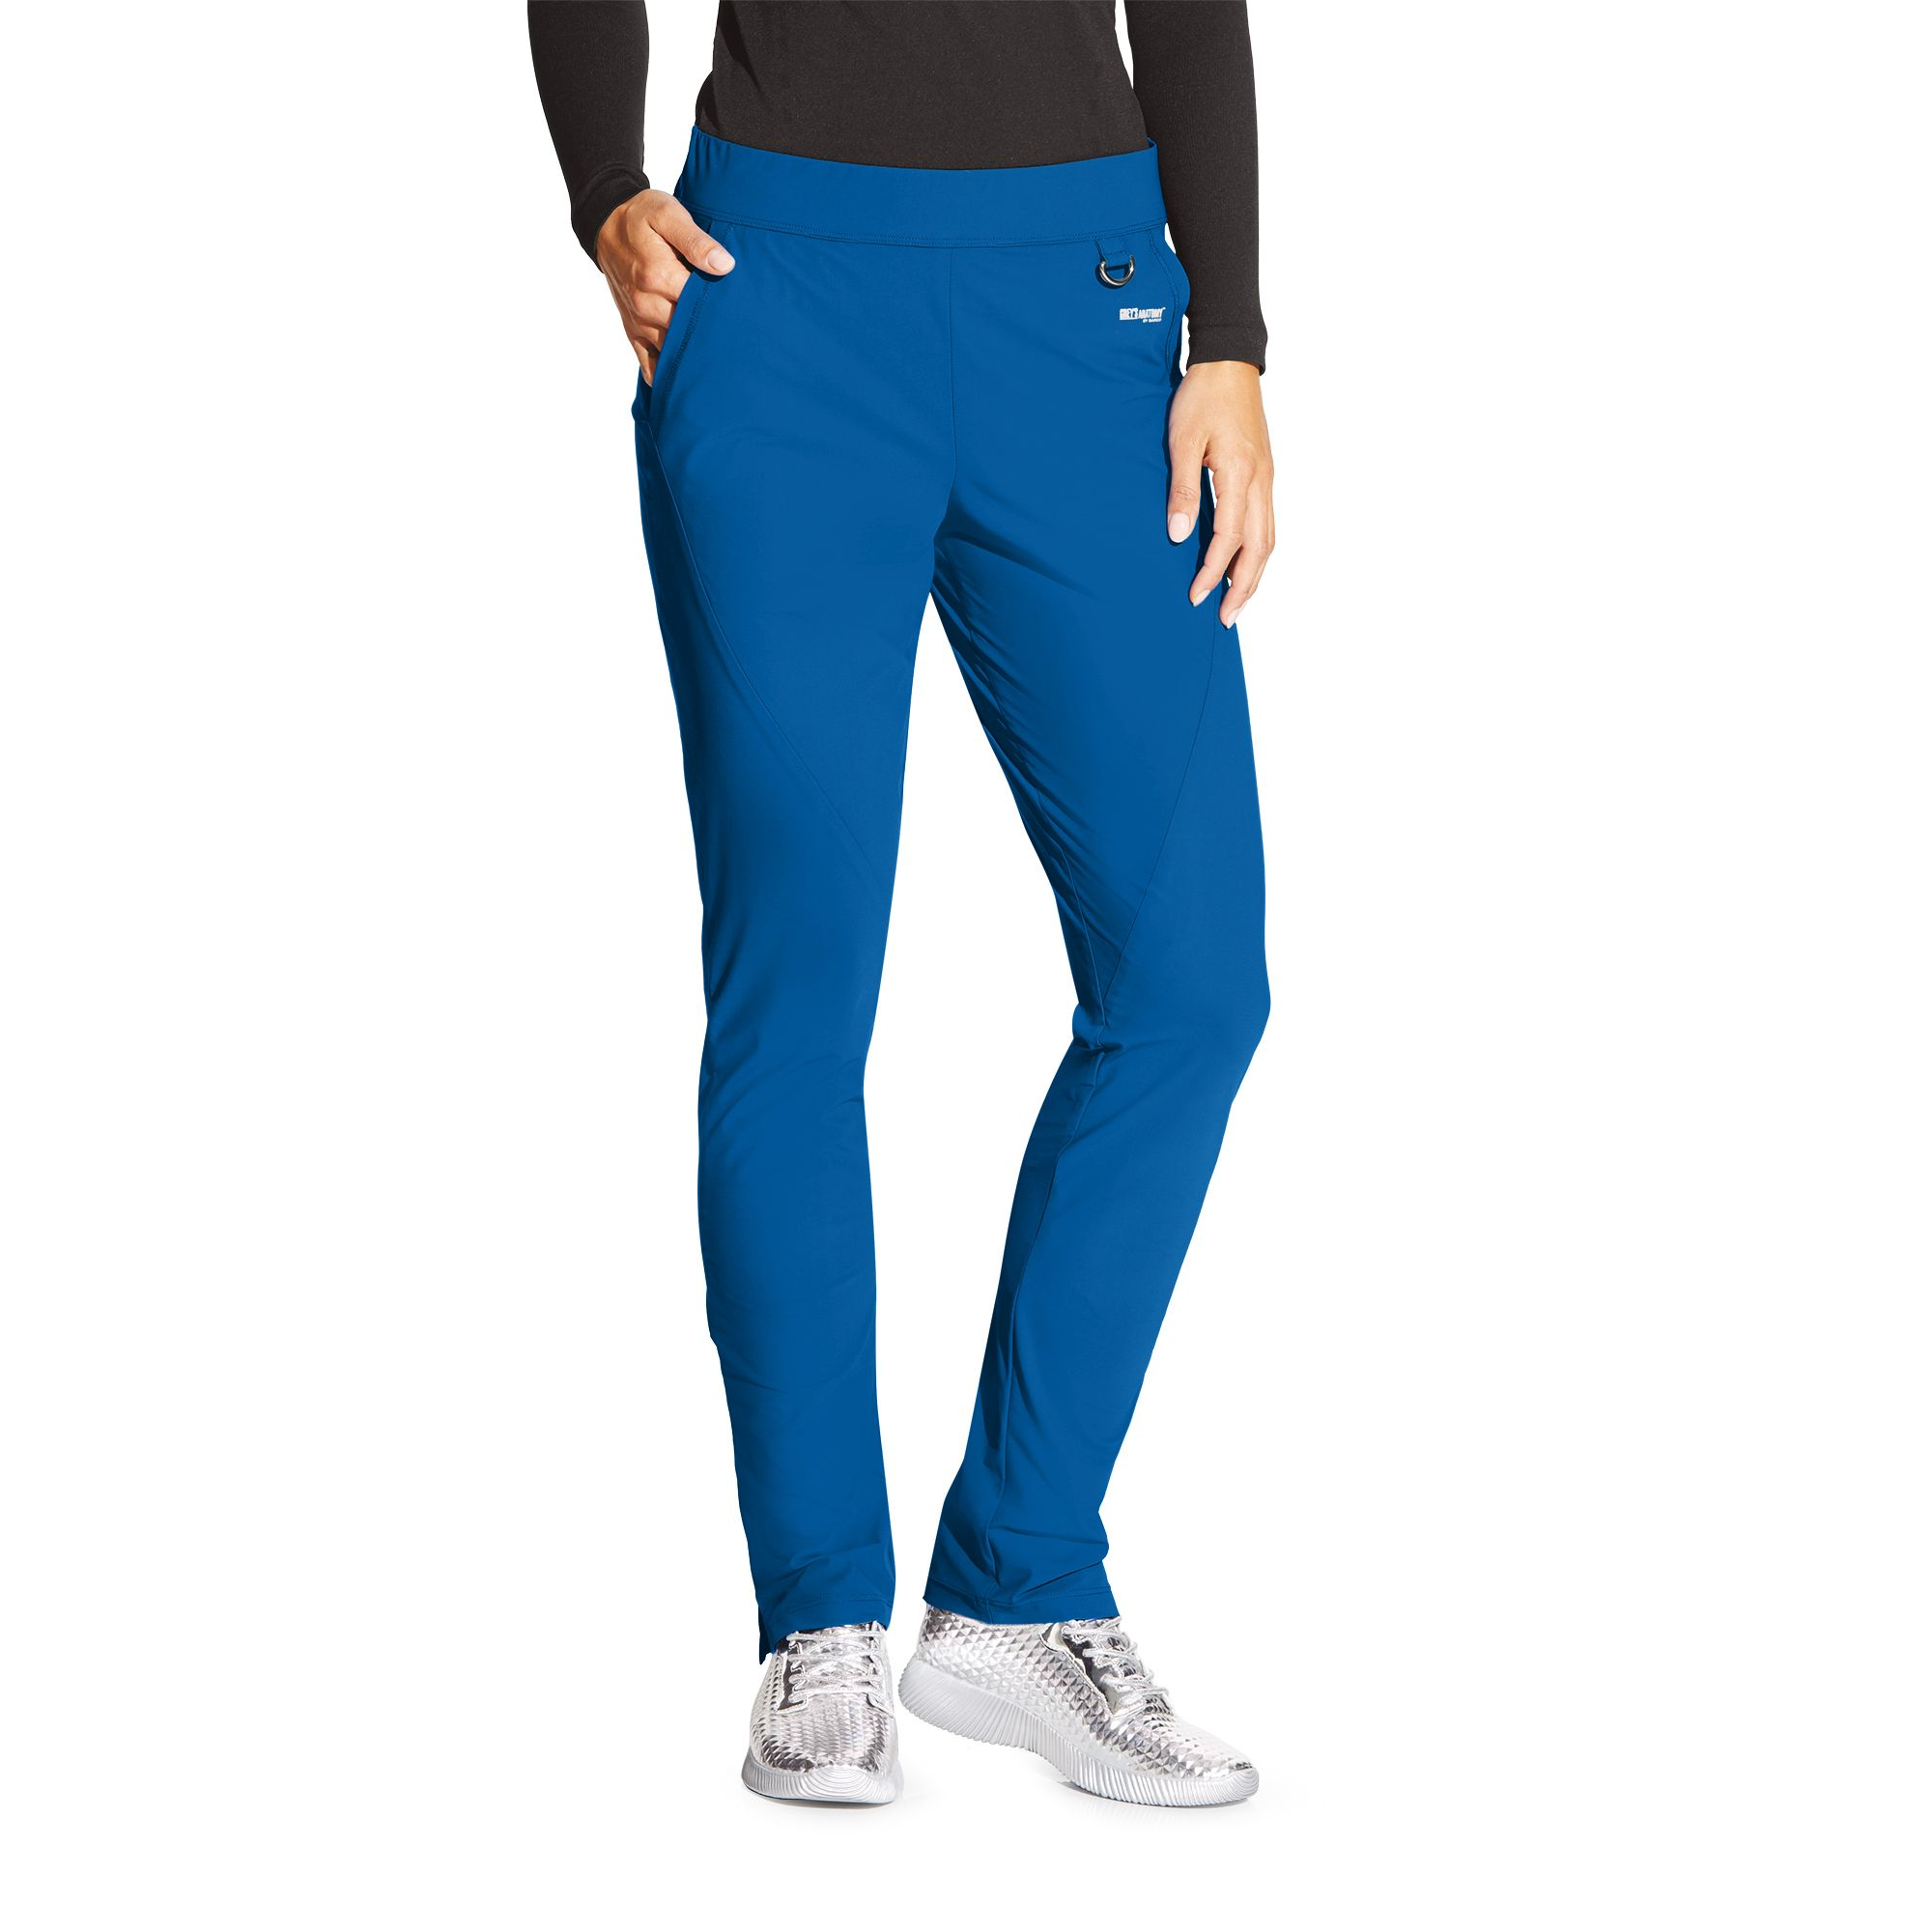 EDGE - NEW Stretch 3 Pocket Pant-Greys Anatomy Edge